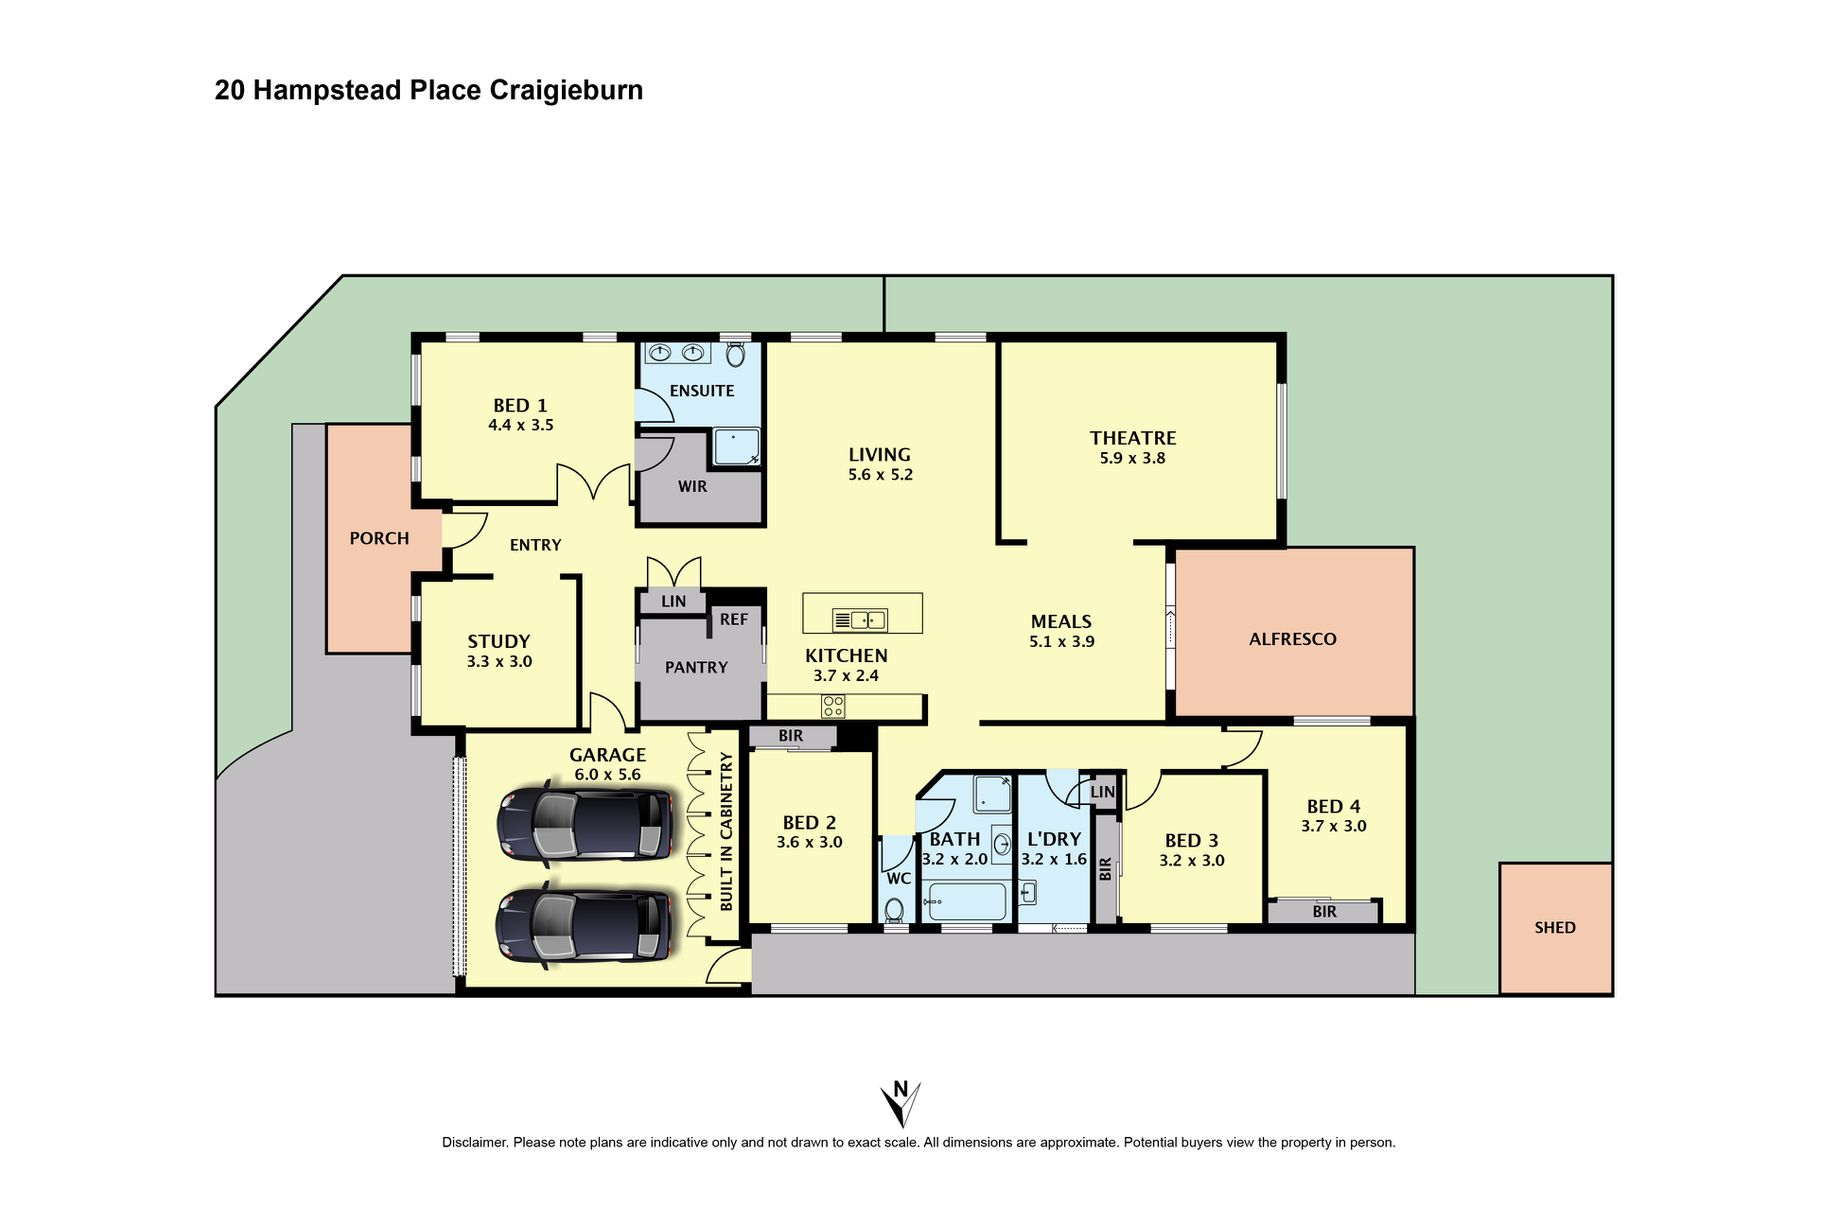 20 Hampstead Place, Craigieburn